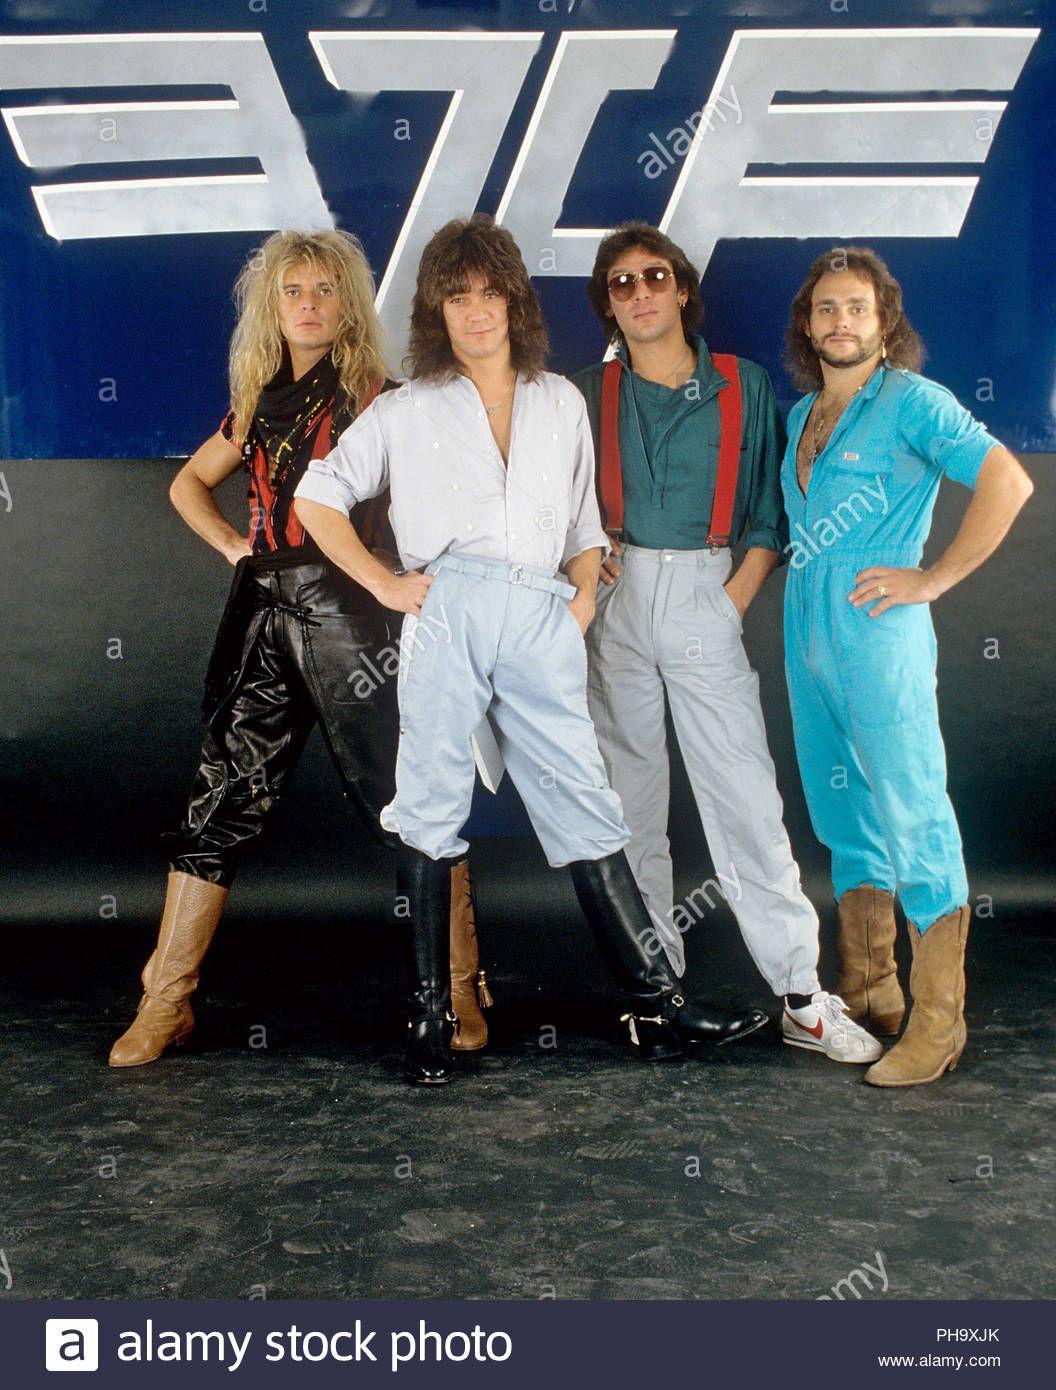 These Guys And Their Photo Shoots David Always Stands Out Rf Eddie Van Halen Van Halen Van Halen 5150